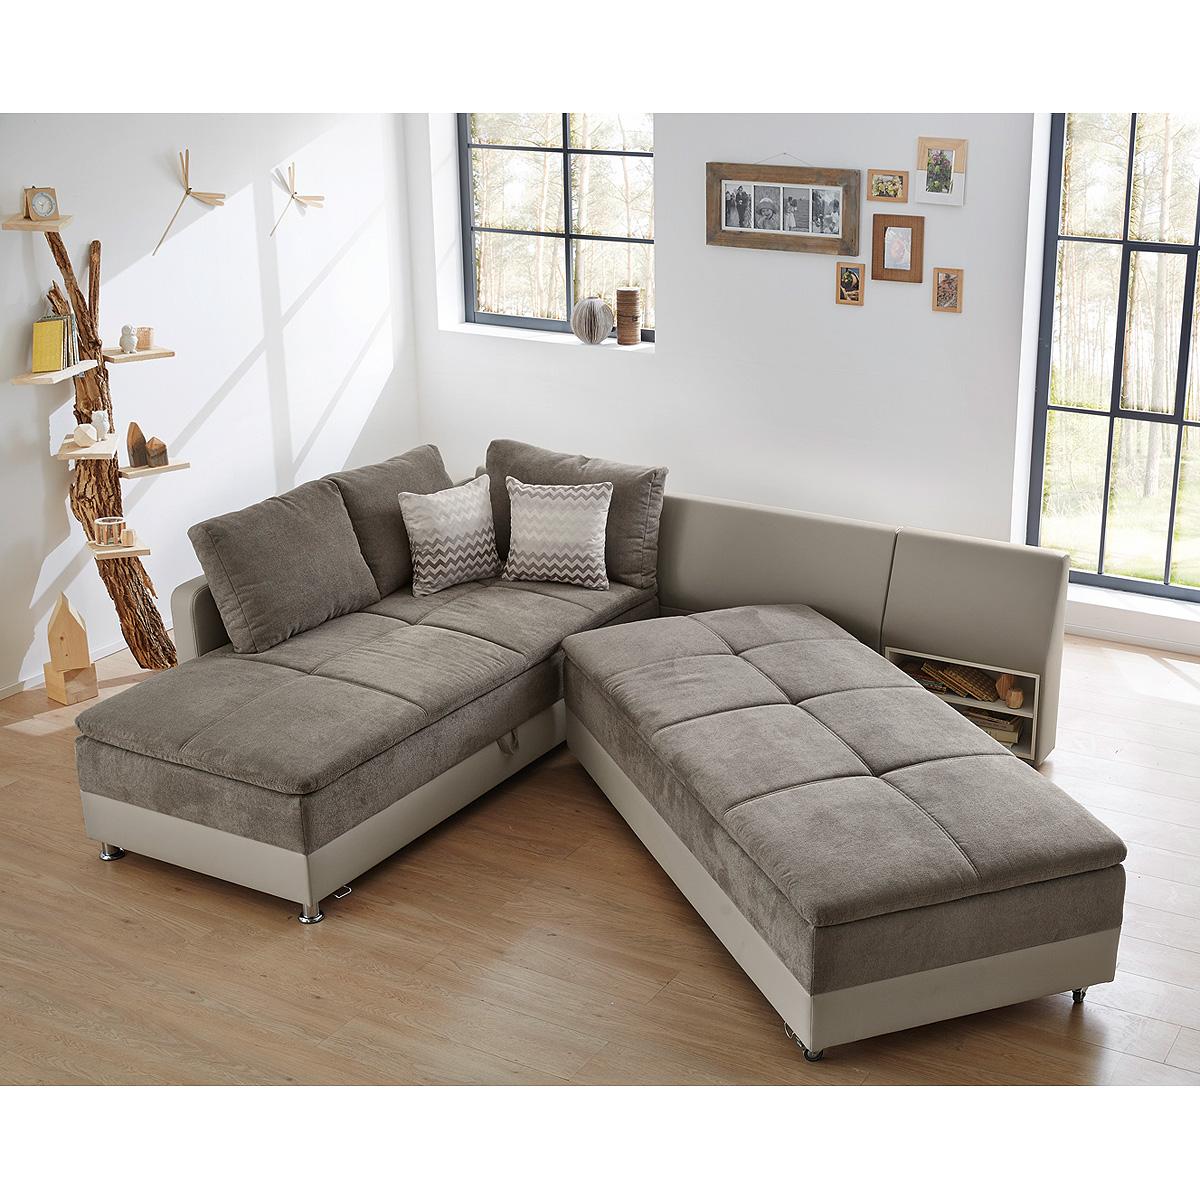 Wohnlandschaft modena sofa ecksofa bett nako greige grau for Bett mit couch